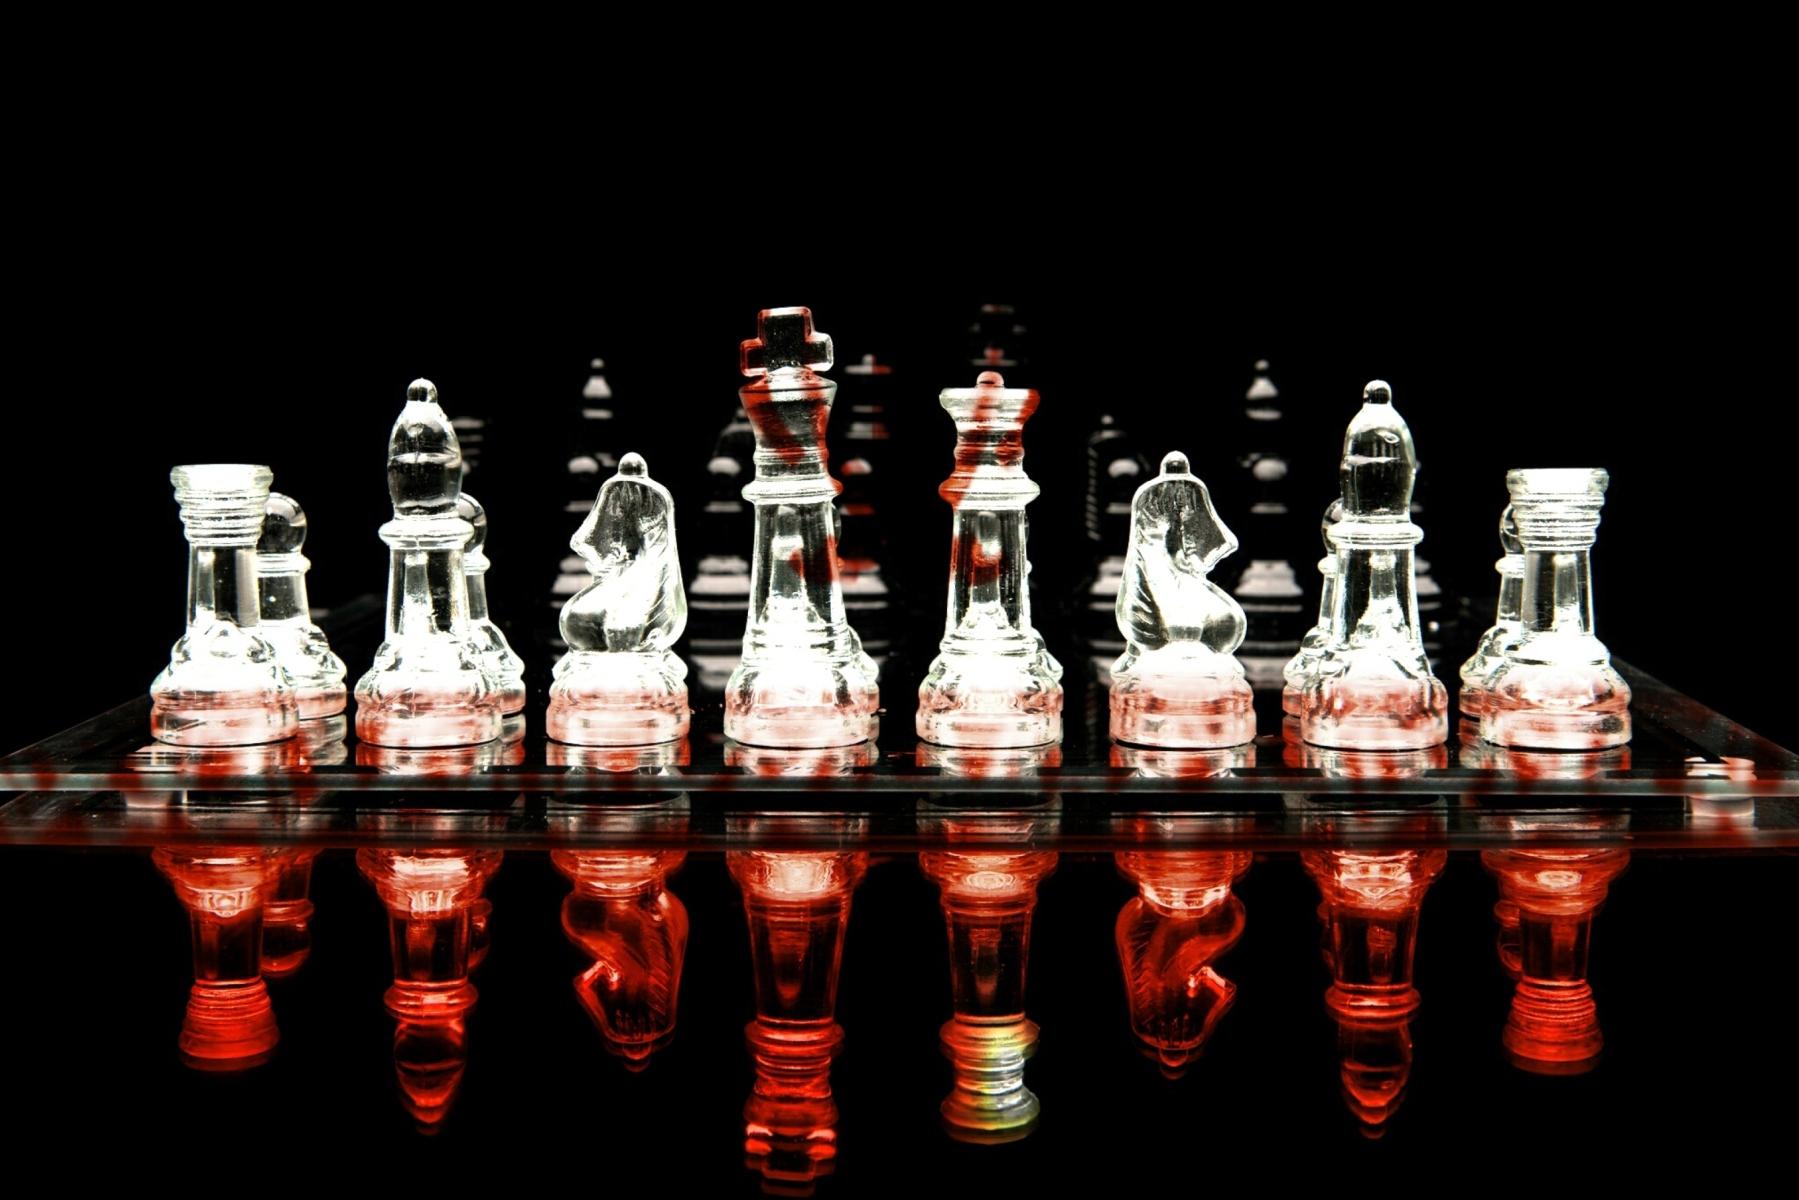 4 way chess online 2002 vw radio wiring diagram susan polgar global daily news and information 3